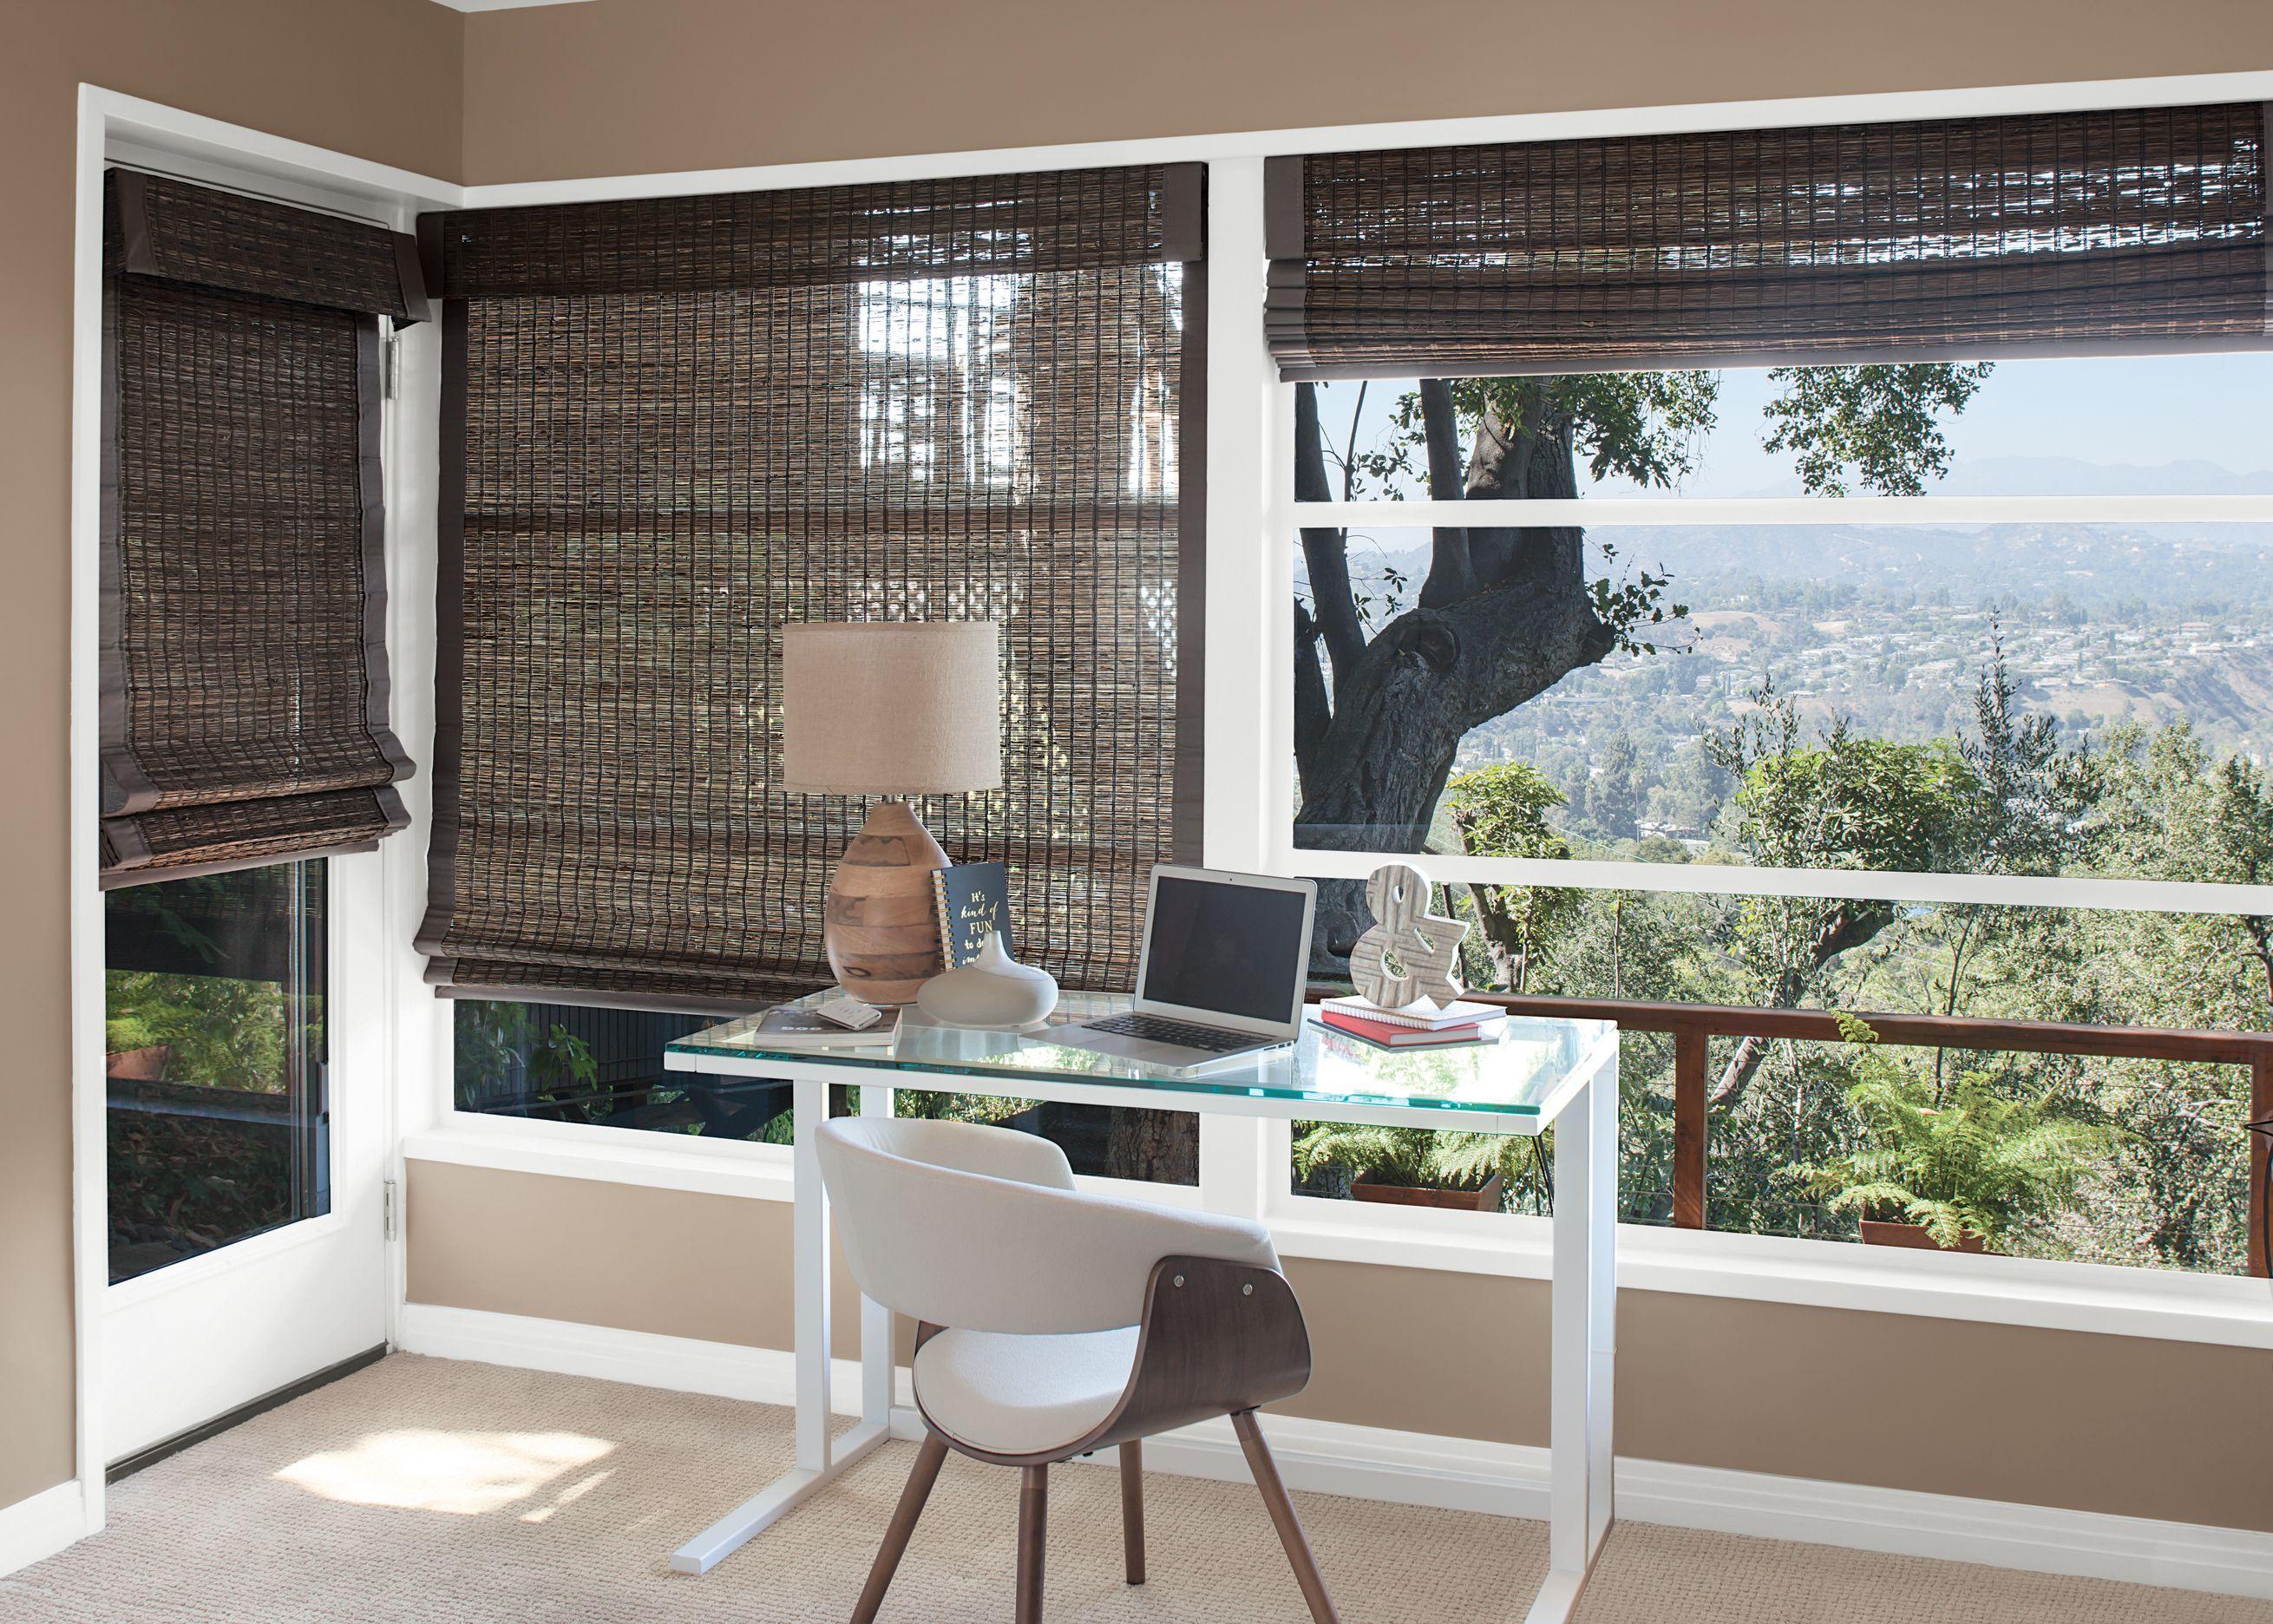 Natural Woven Shades Adding A Sense Of Nature To This Home Office Naturalwovenshades Smithandnoble Smithandnob